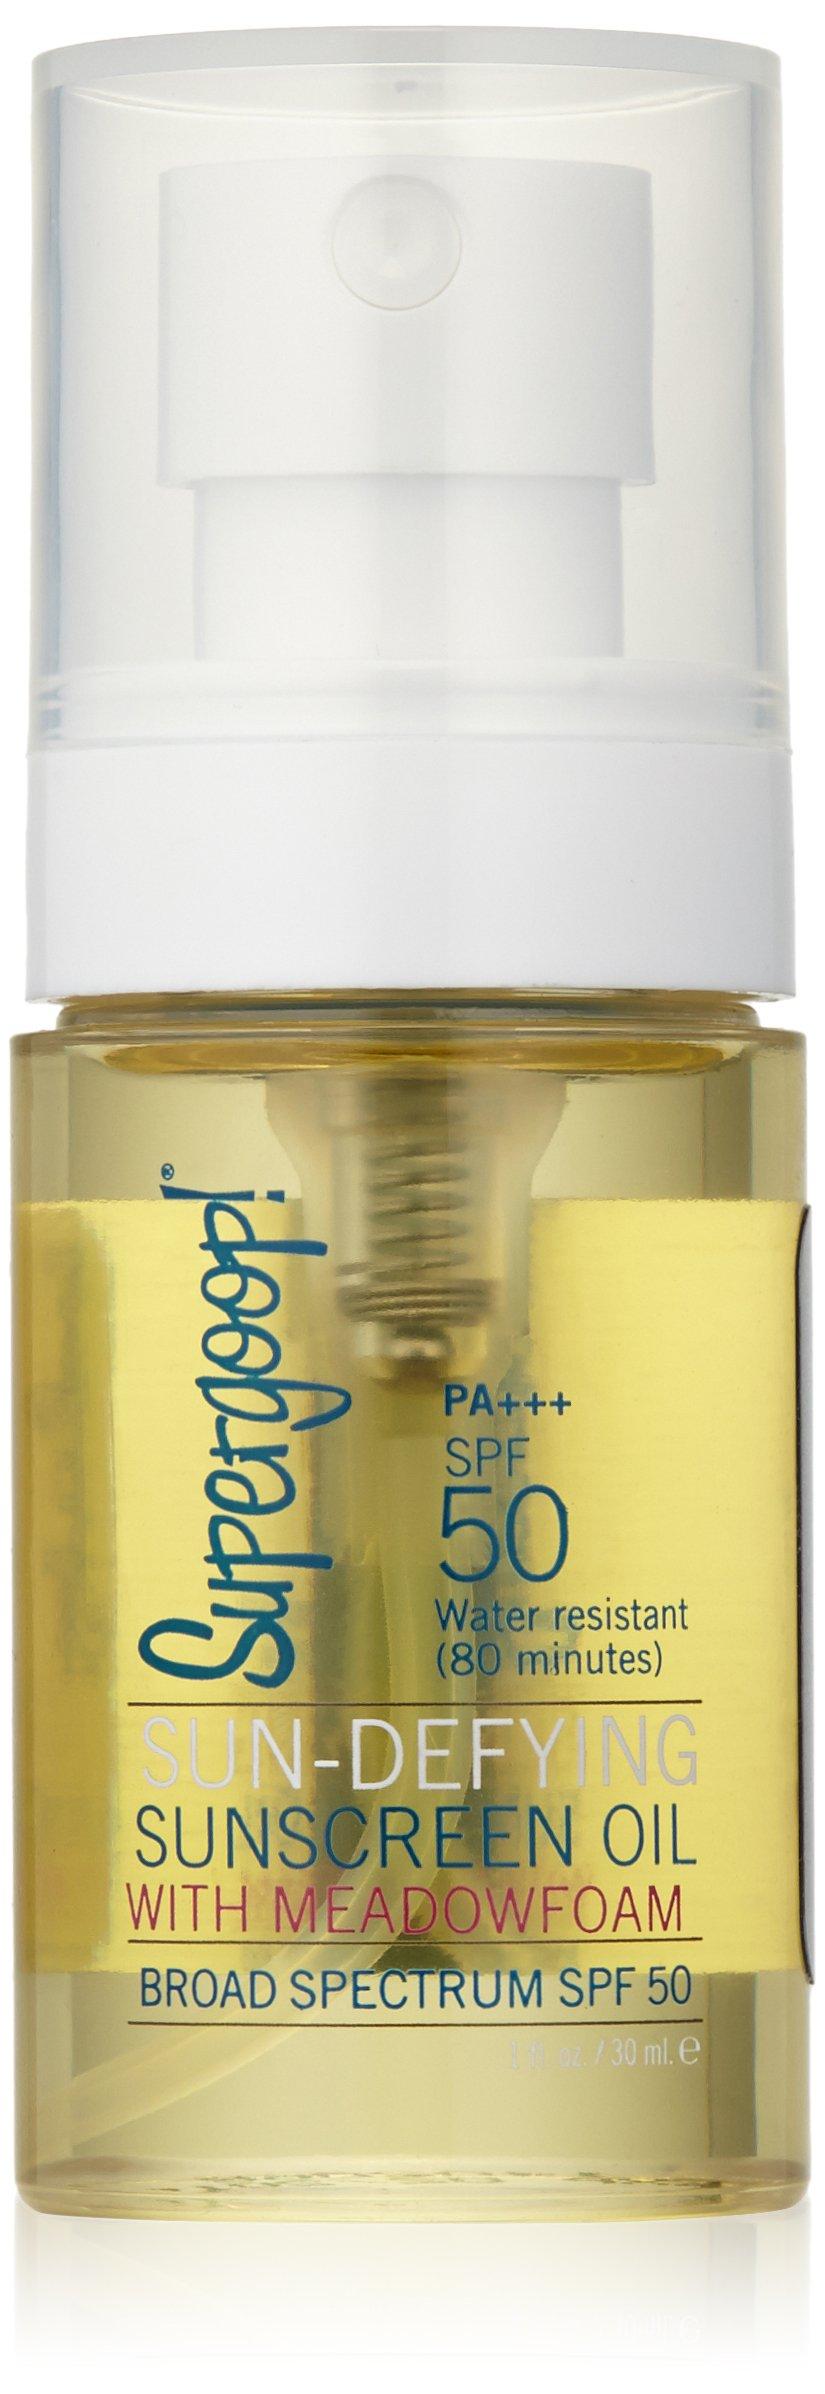 Supergoop! Sun-Defying Sunscreen Oil with Meadowfoam SPF 50, 1 fl. oz. by Supergoop!